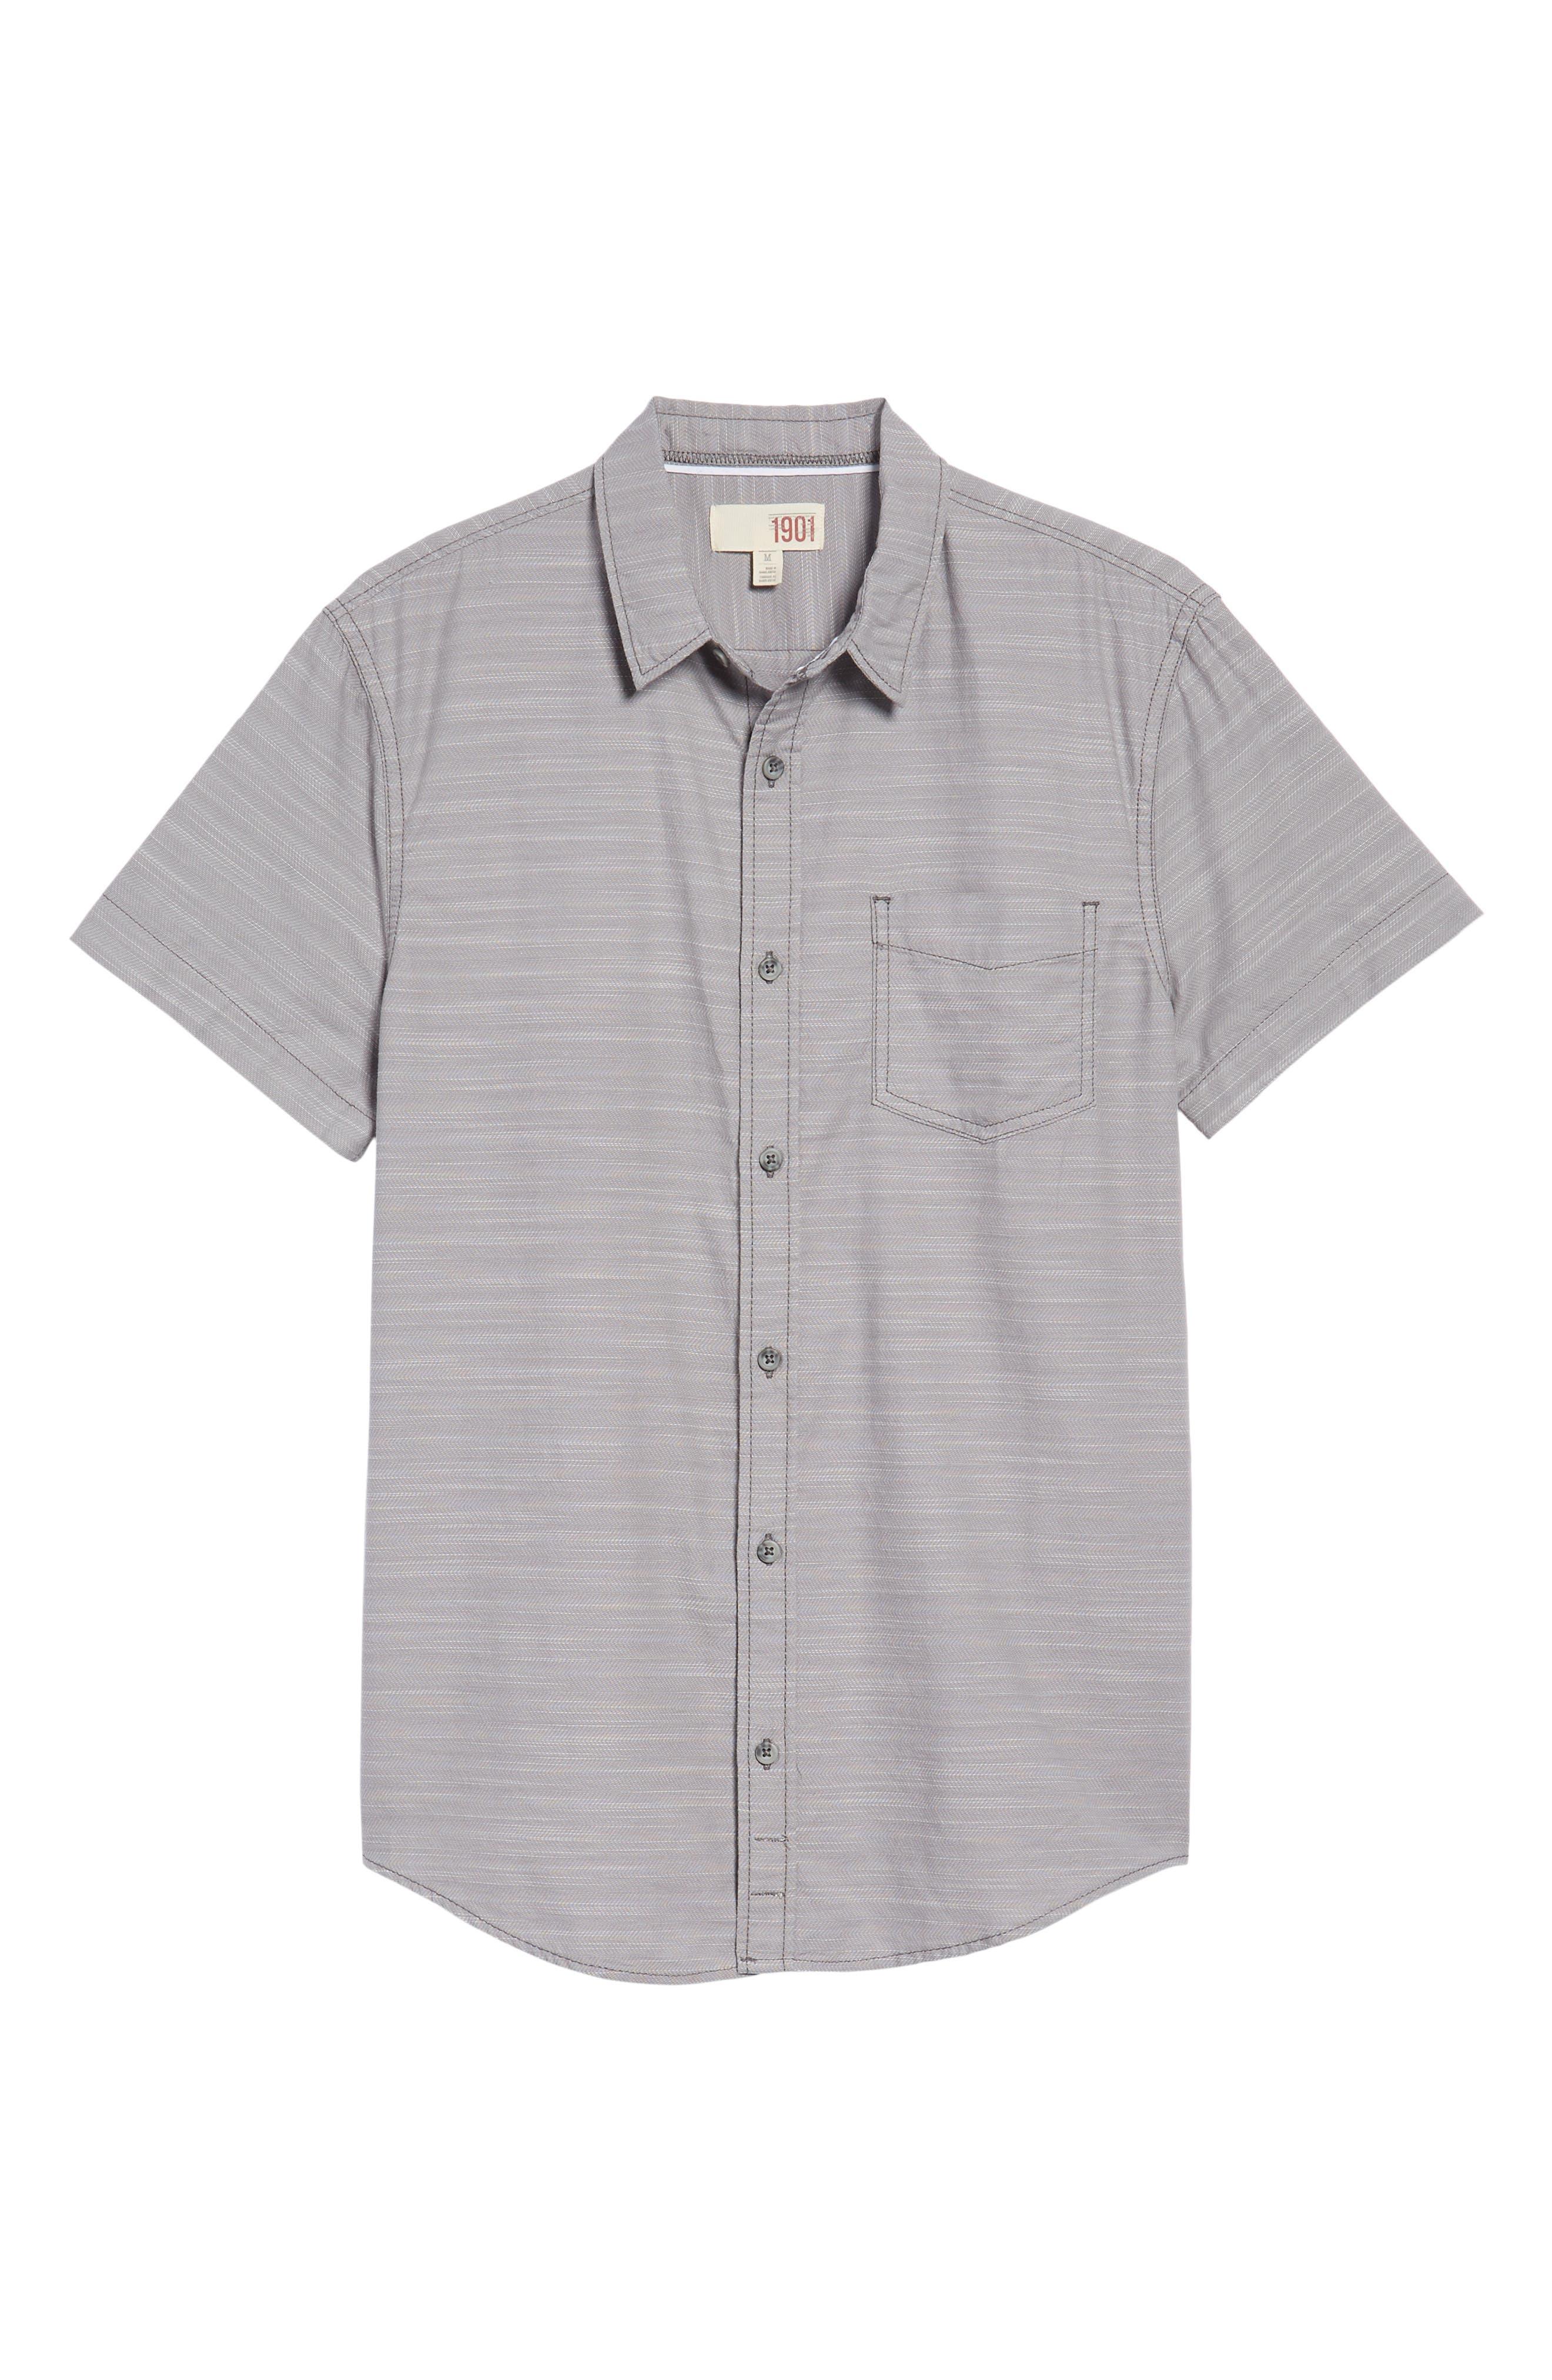 Herringbone Chambray Shirt,                             Alternate thumbnail 6, color,                             030